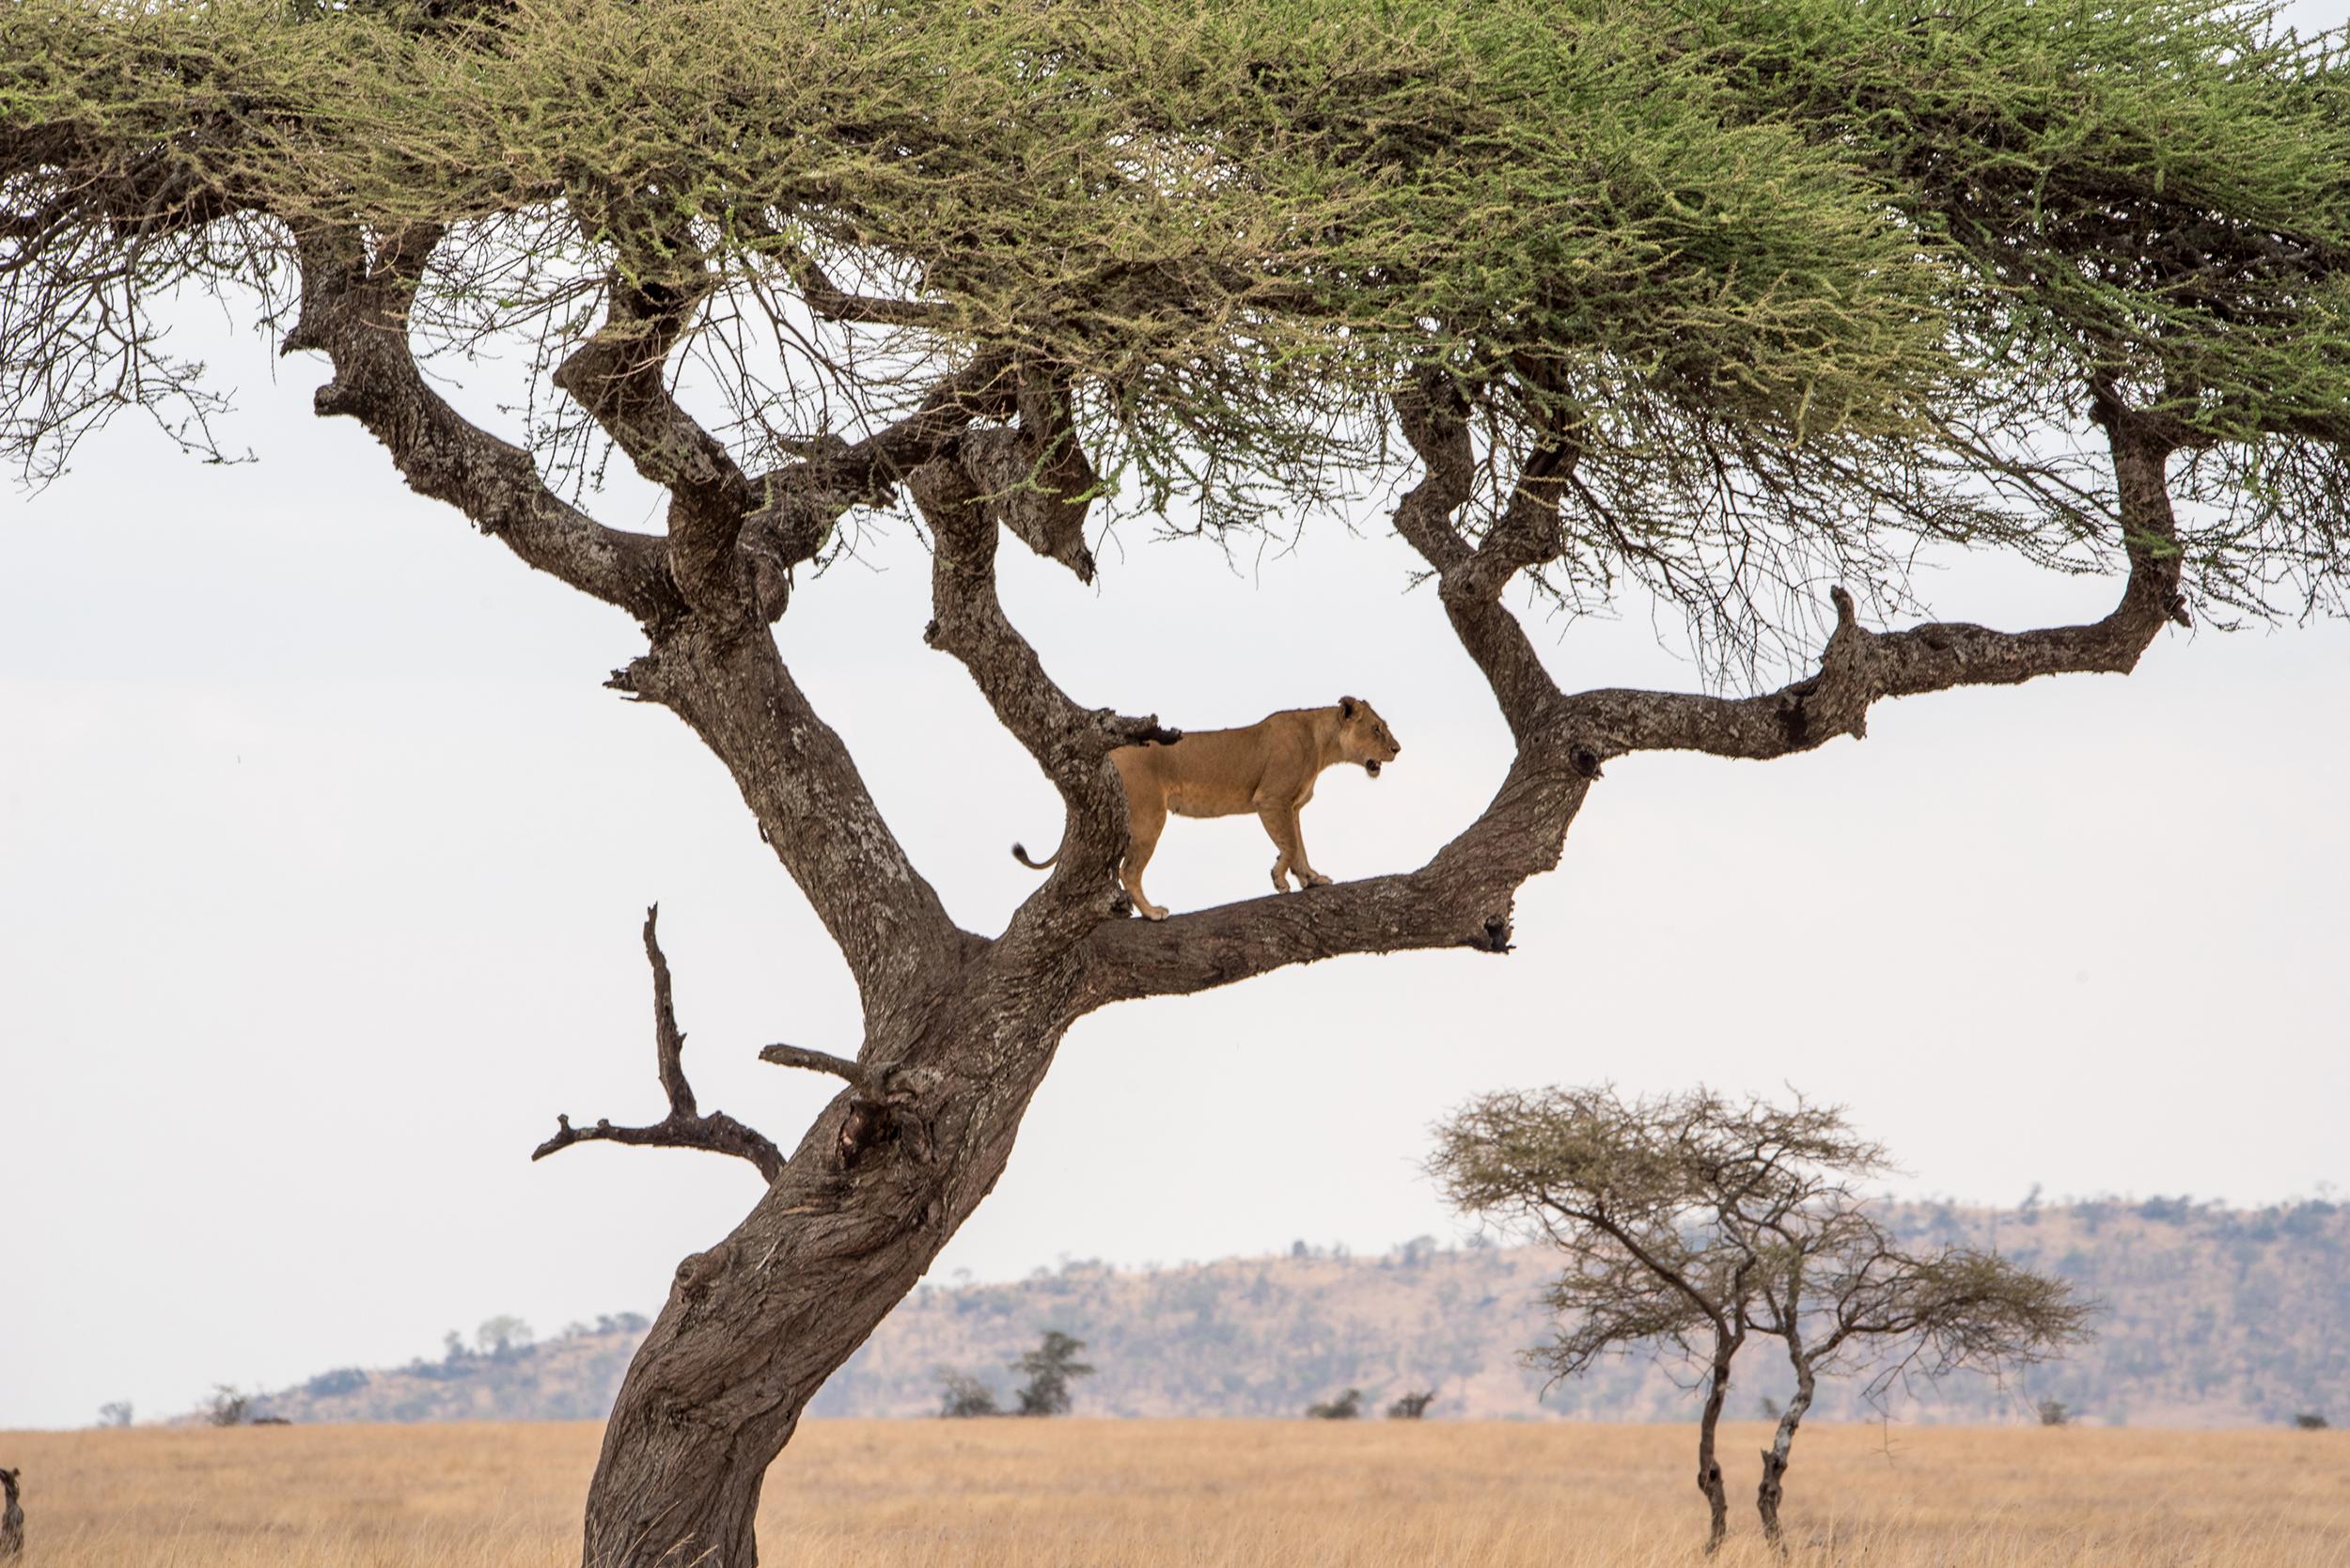 Spot the tree climbing lions